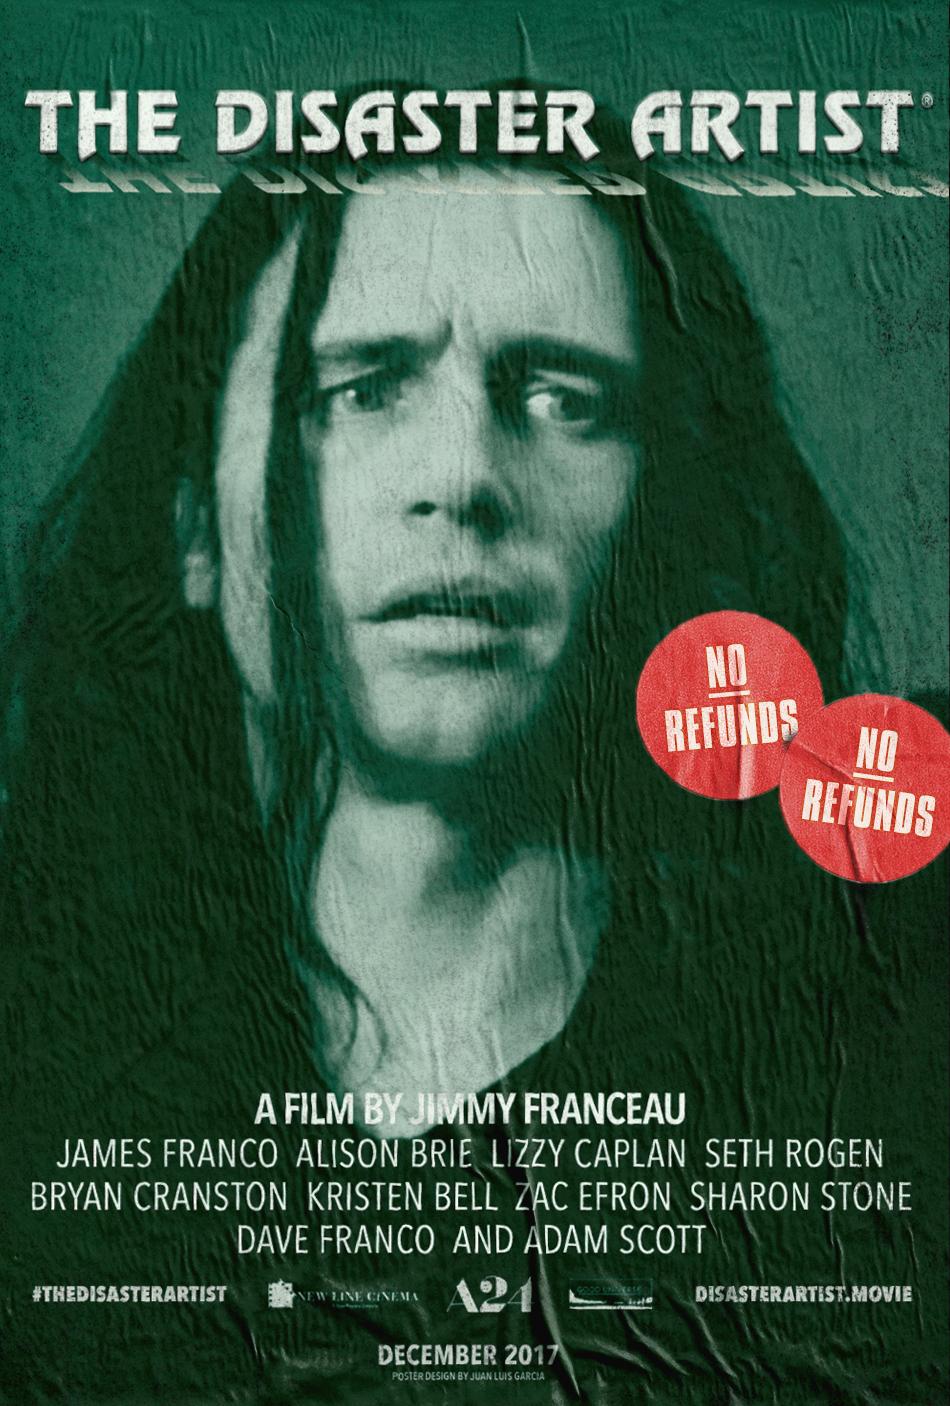 The-Disaster-Artist-James-Franco-Seth-Rogen-A24-Tommy-Wiseau-Juan-Luis-Garcia-Movie-Poster-Design-01.jpg